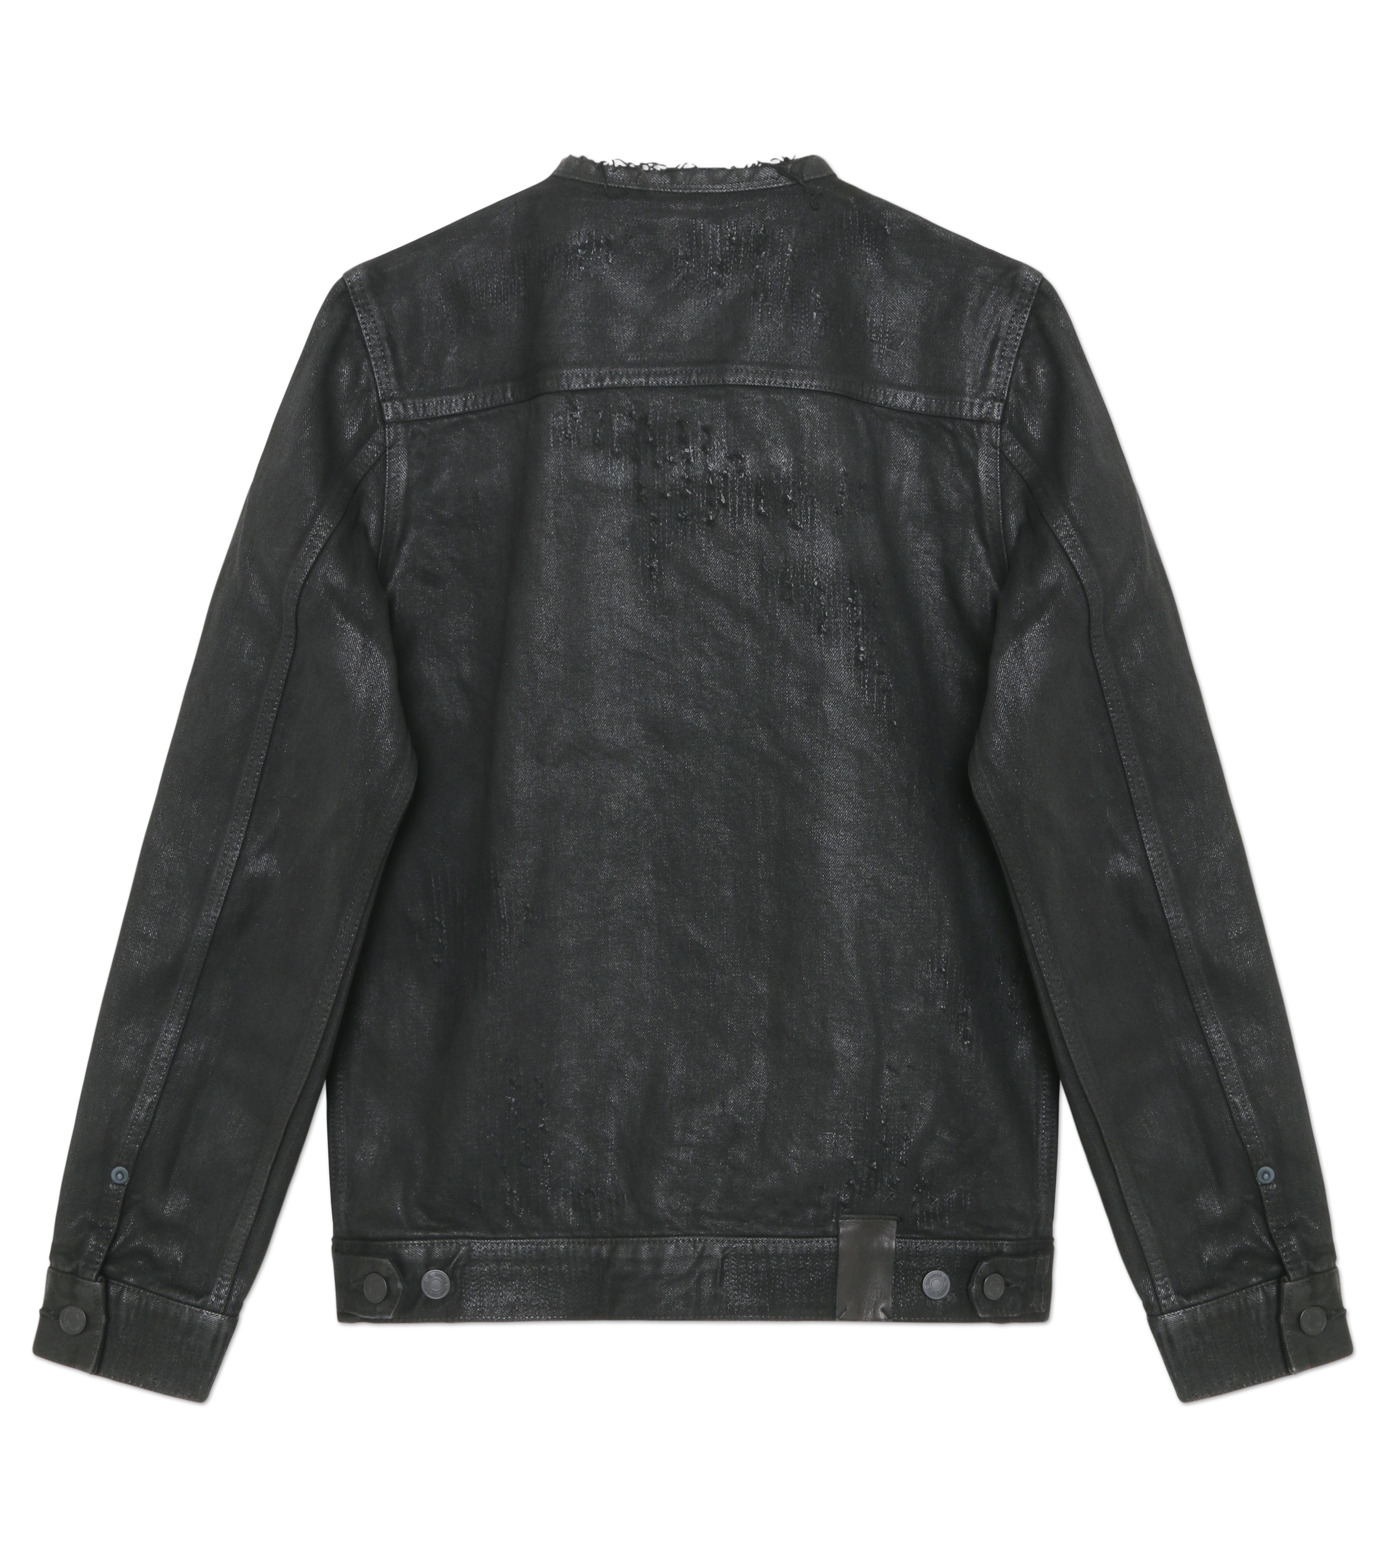 HL HEDDIE LOVU(エイチエル・エディールーヴ)のCOLLARLESS DENIM JACKET-BLACK(ジャケット/jacket)-18S94007-13 拡大詳細画像4